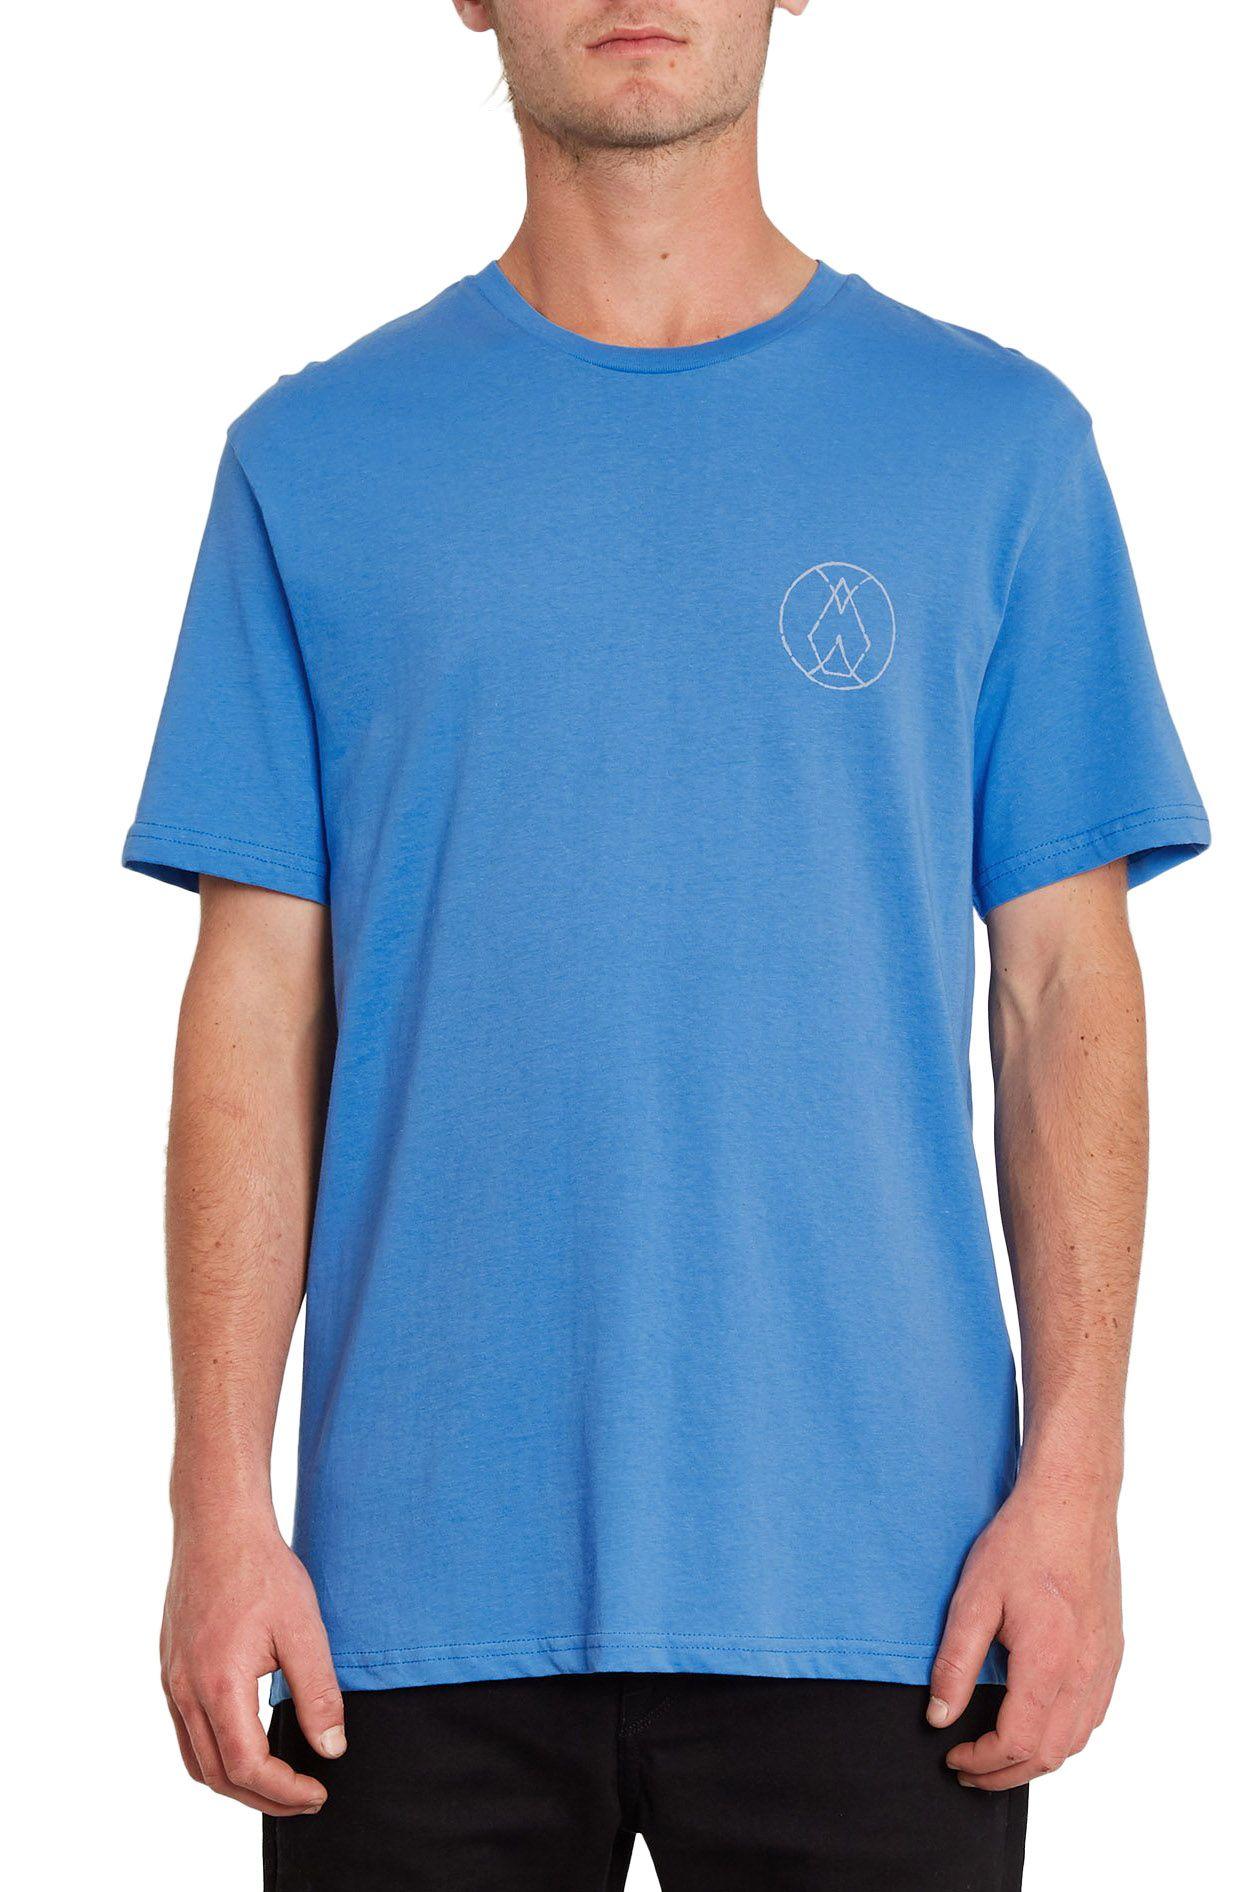 Volcom T-Shirt INNER STONE BSC SS Ballpoint Blue